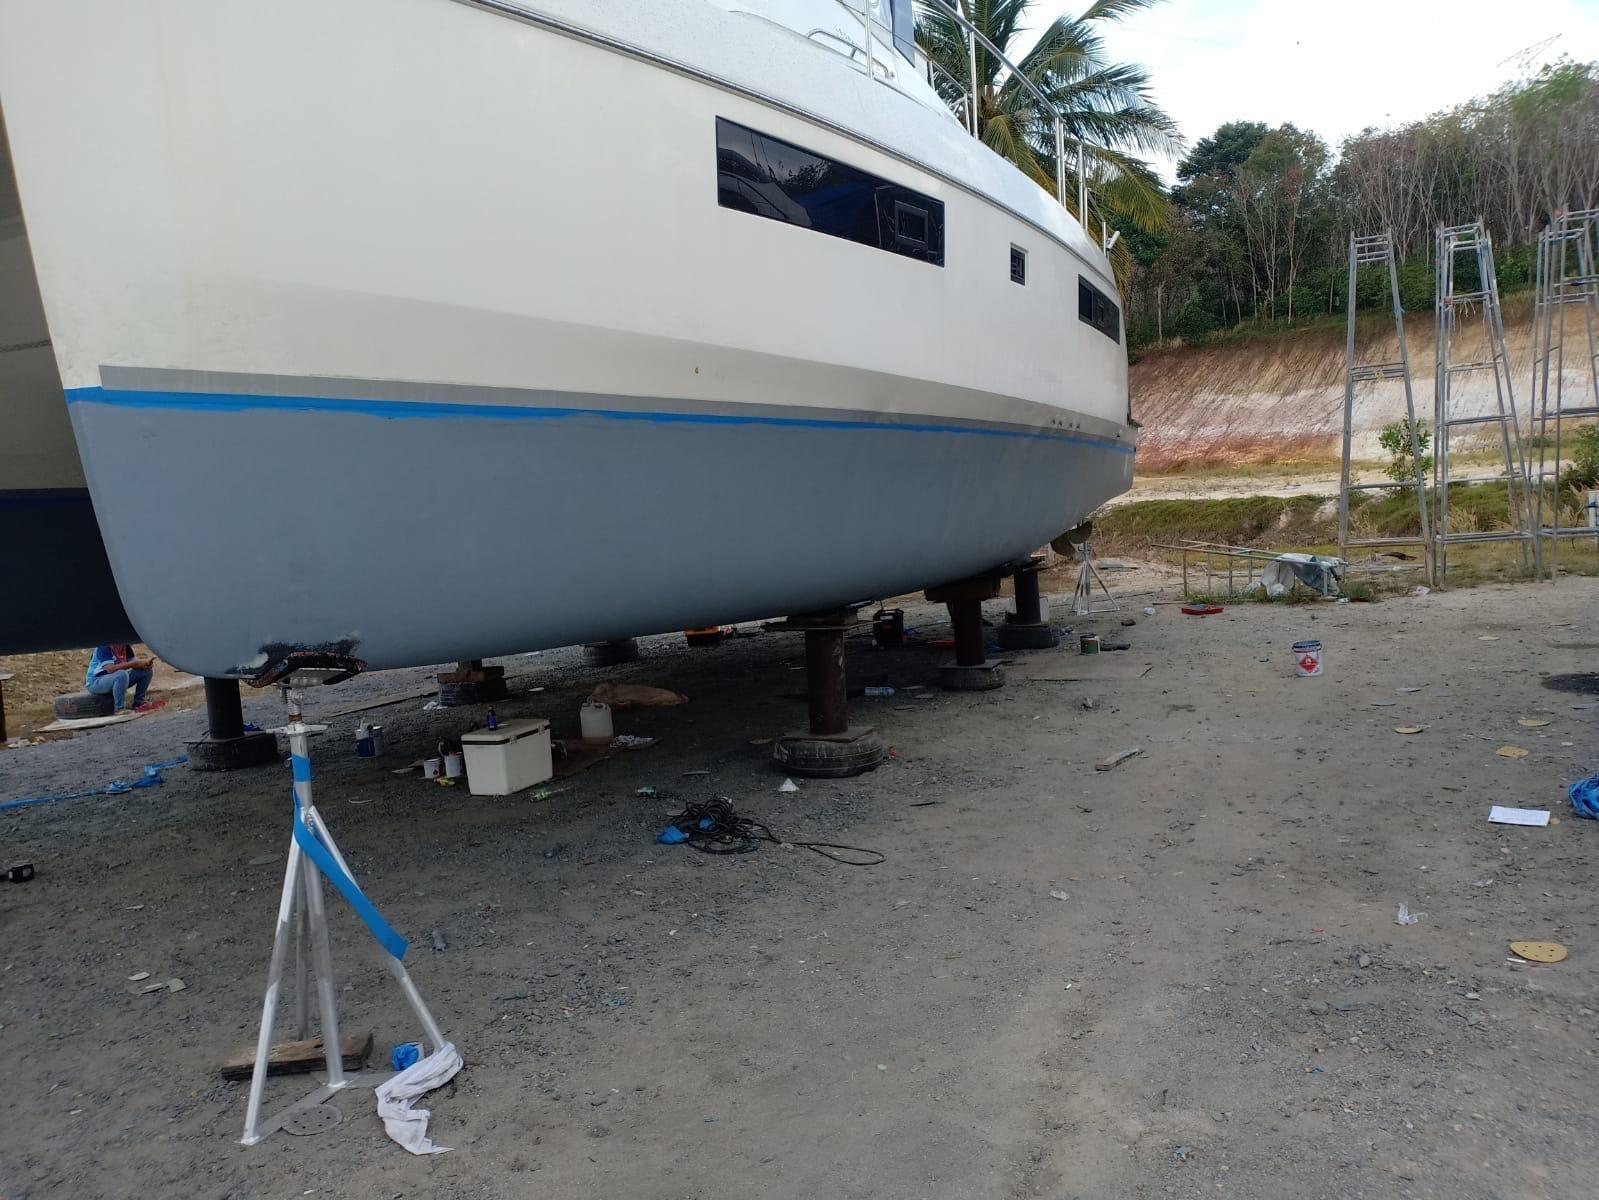 Leopard Catamaran Antifouling Phuket Thailand